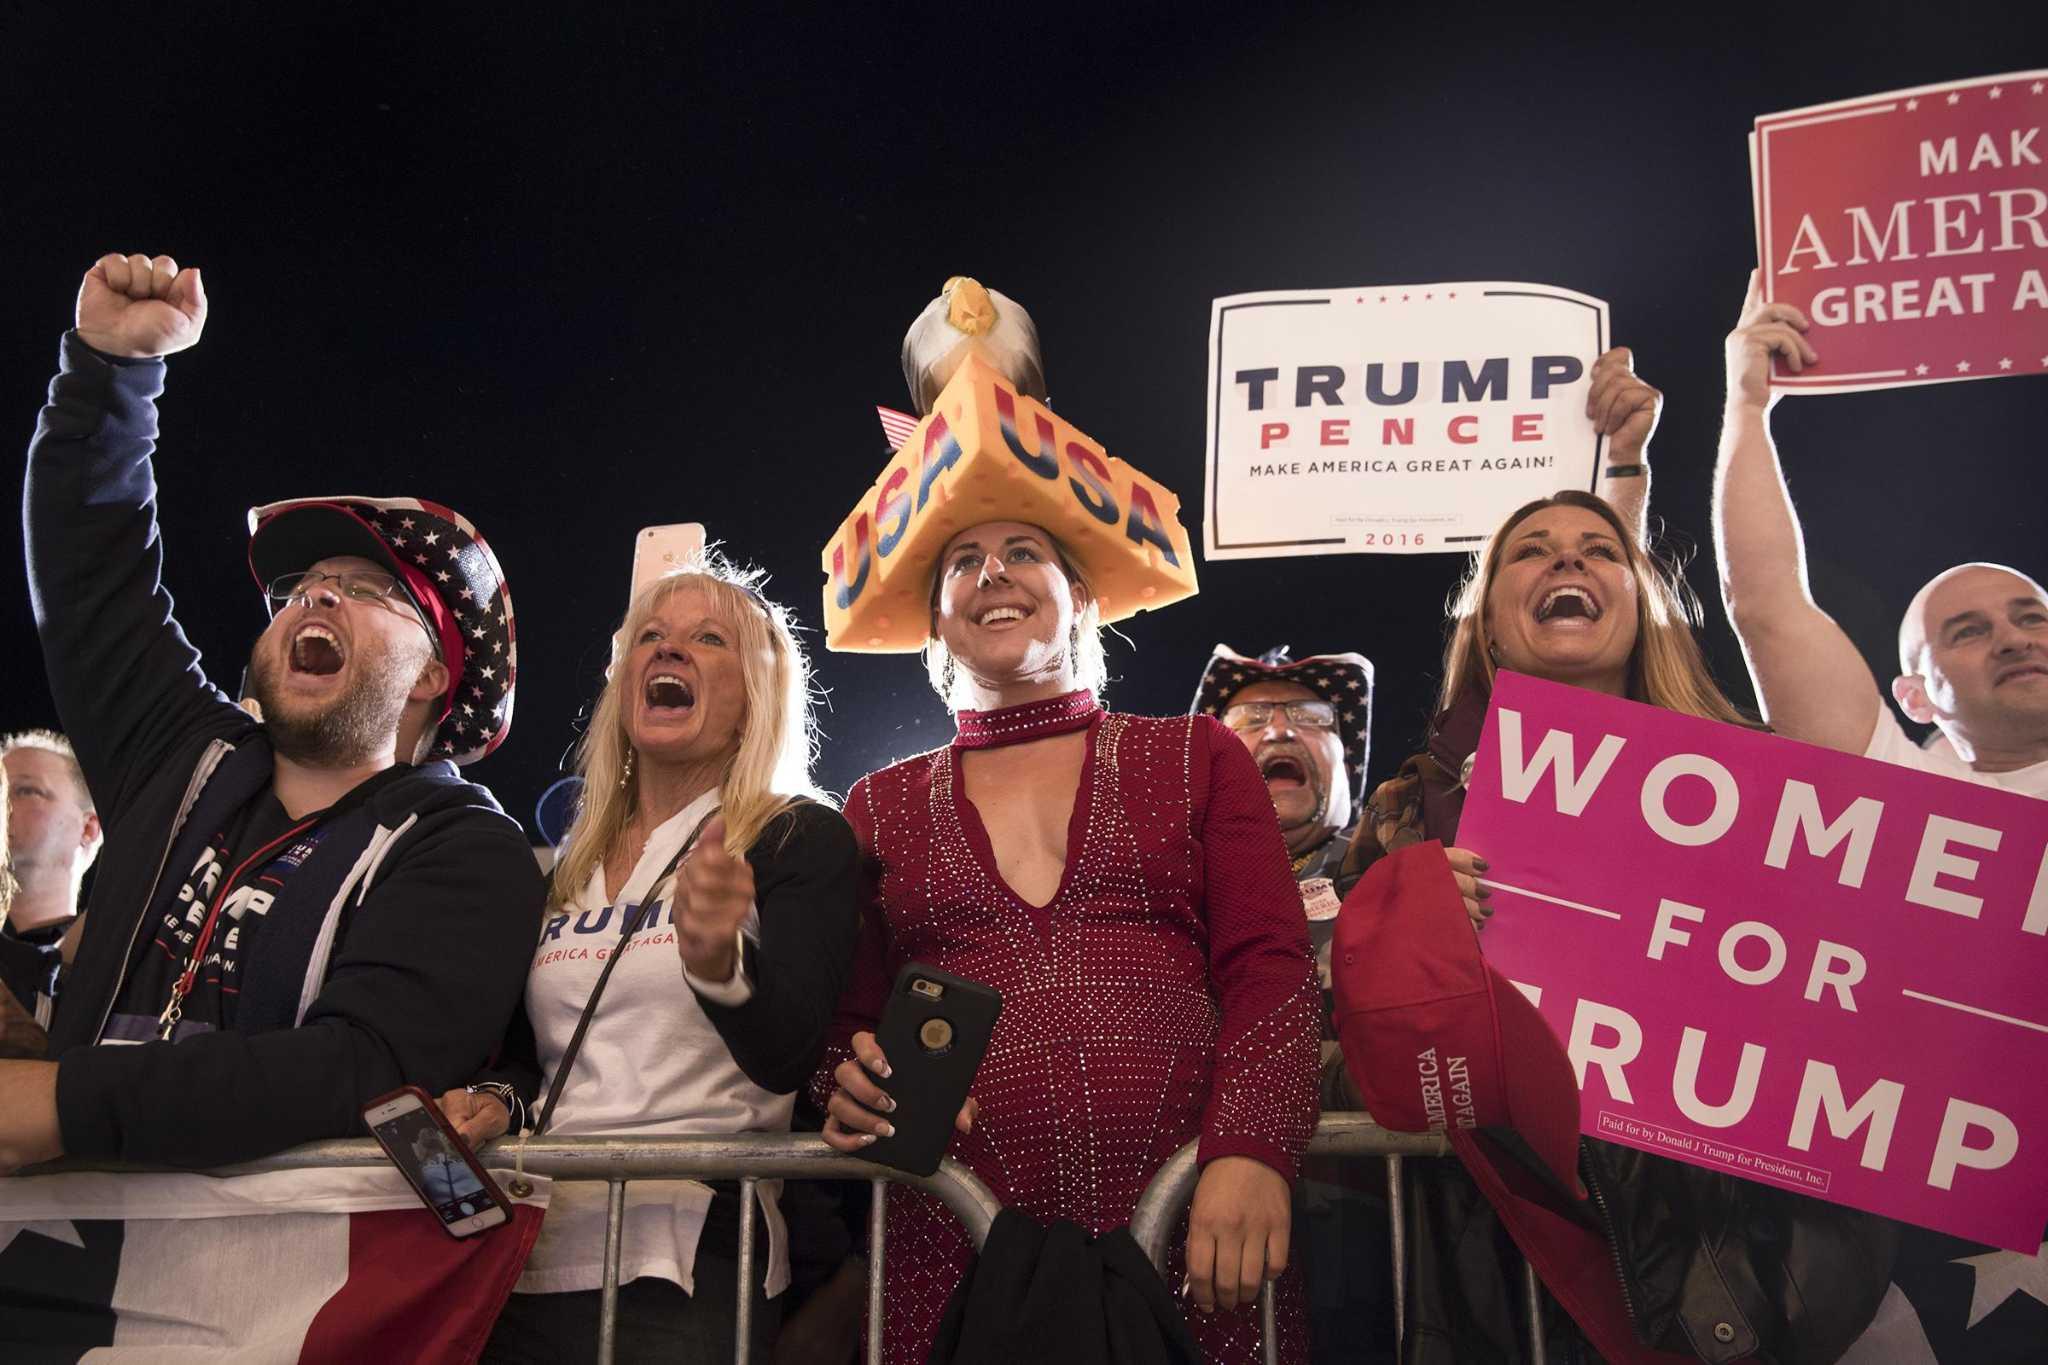 Donald Trump, establishment sellout